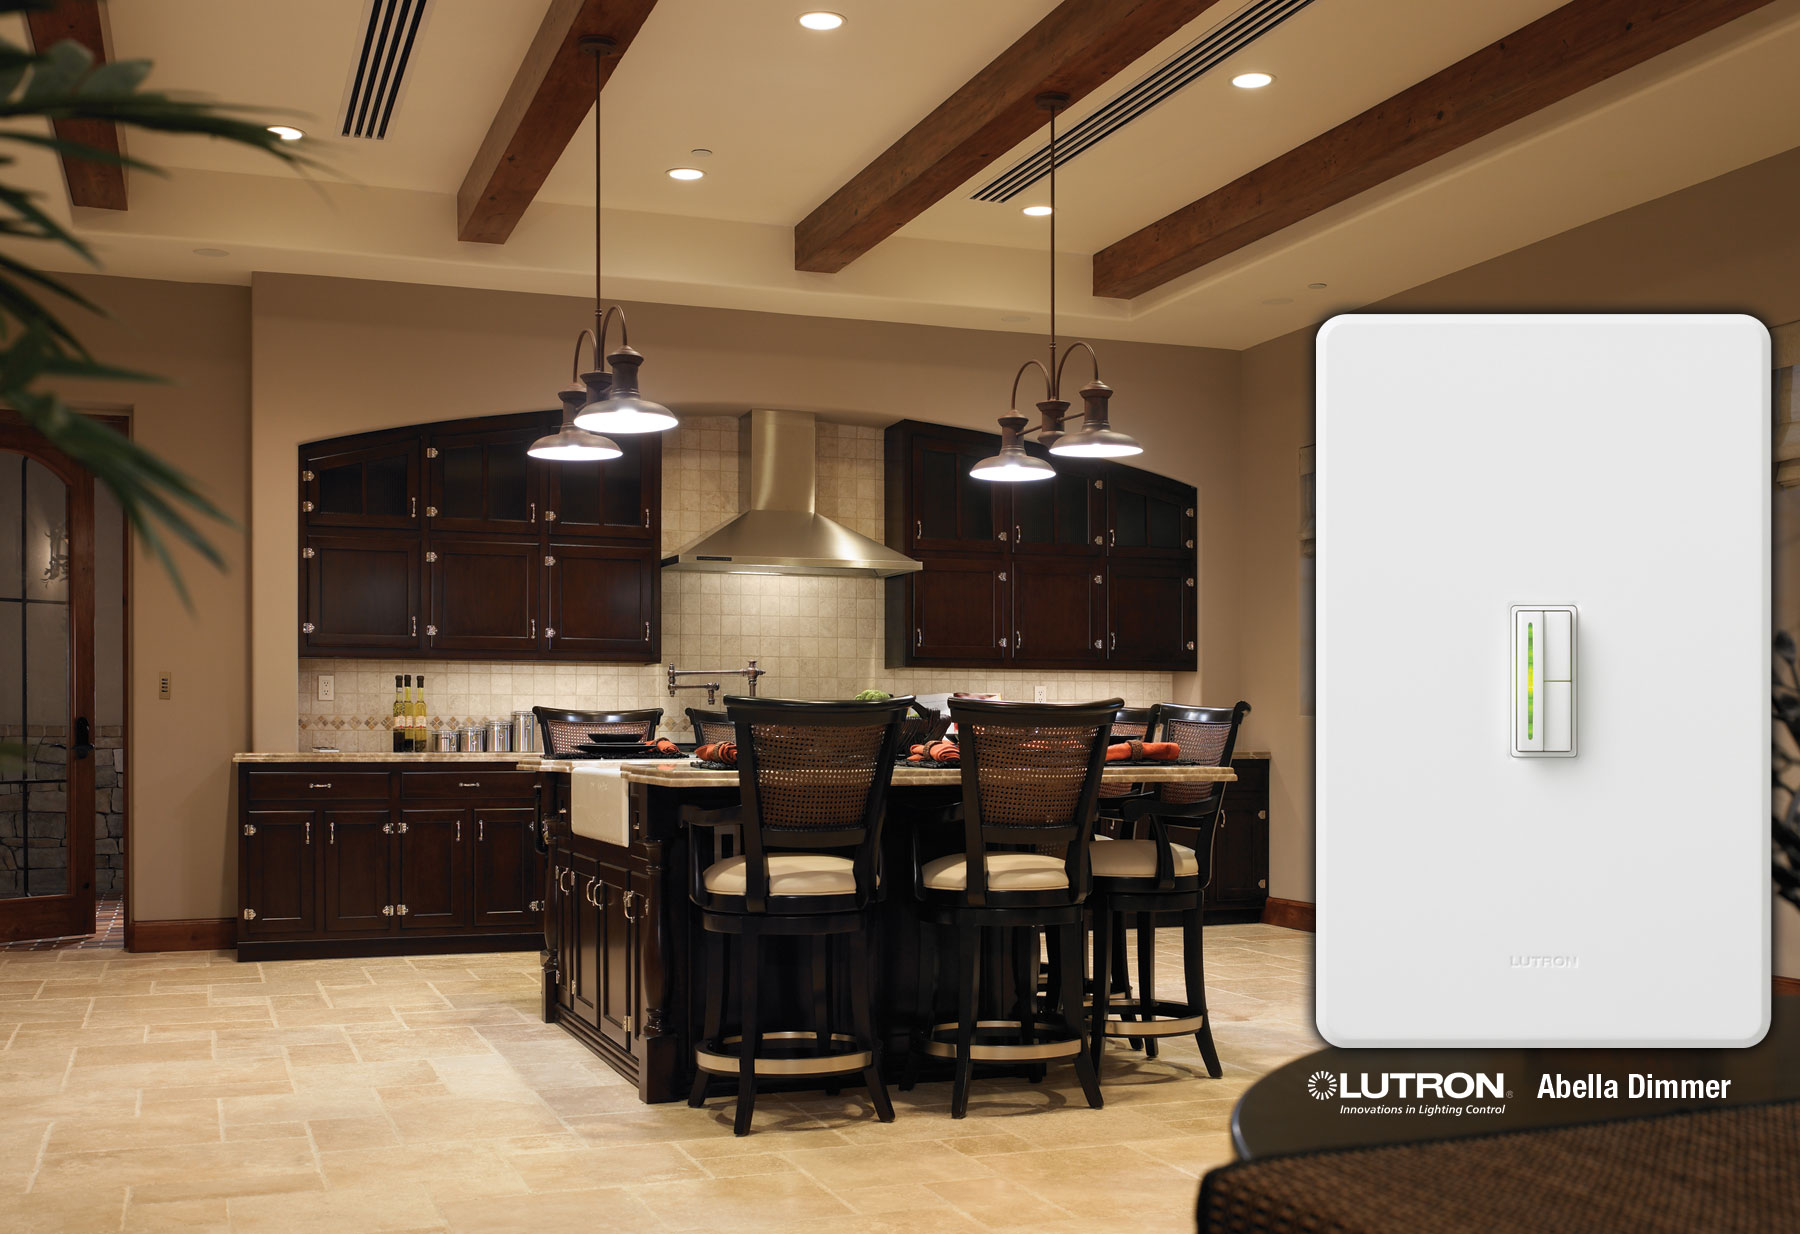 Lutron lighting controls save money rensen house of lights lutron lighting controls save money view larger image mozeypictures Images